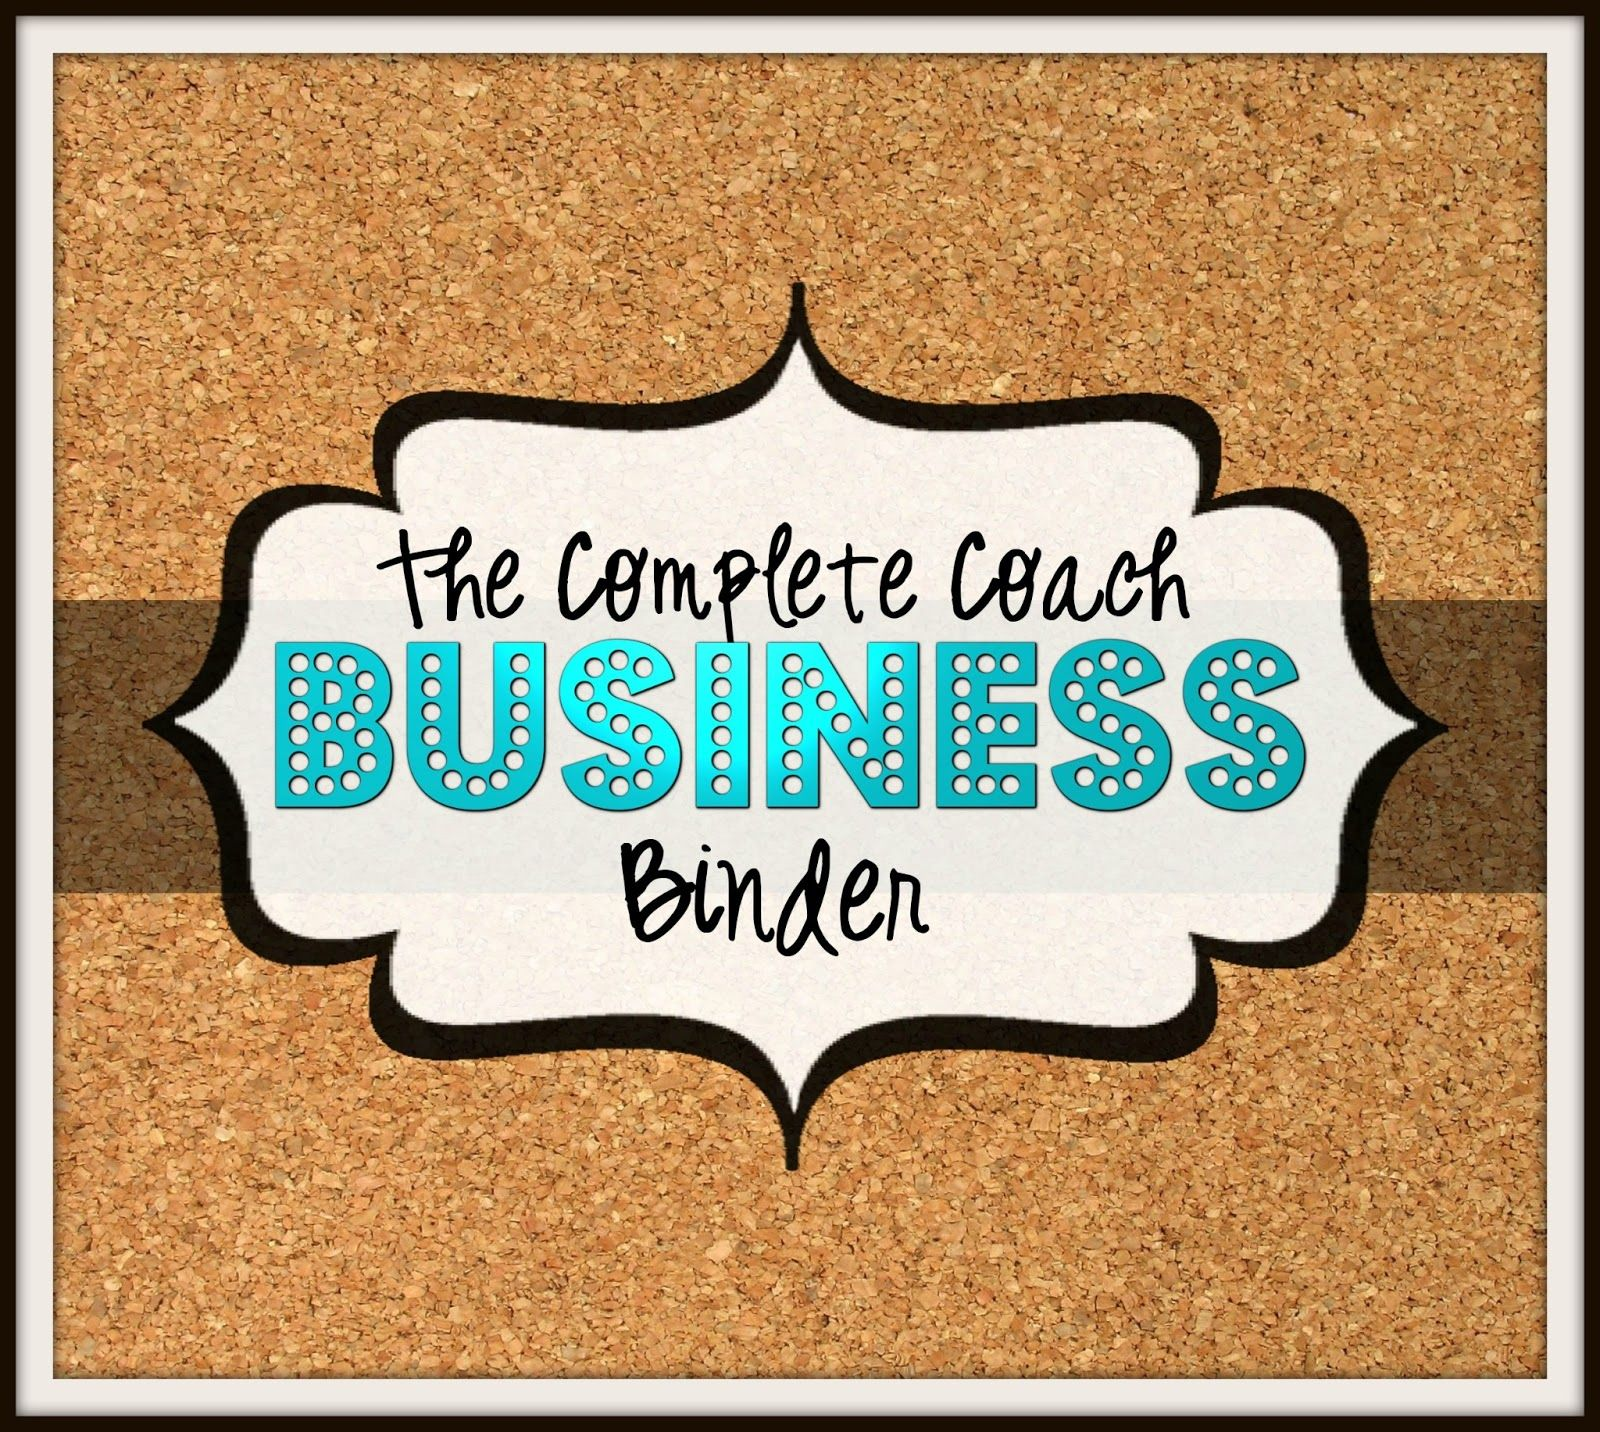 To Insanity Amp Back Beachbody Coach Business Super Binder